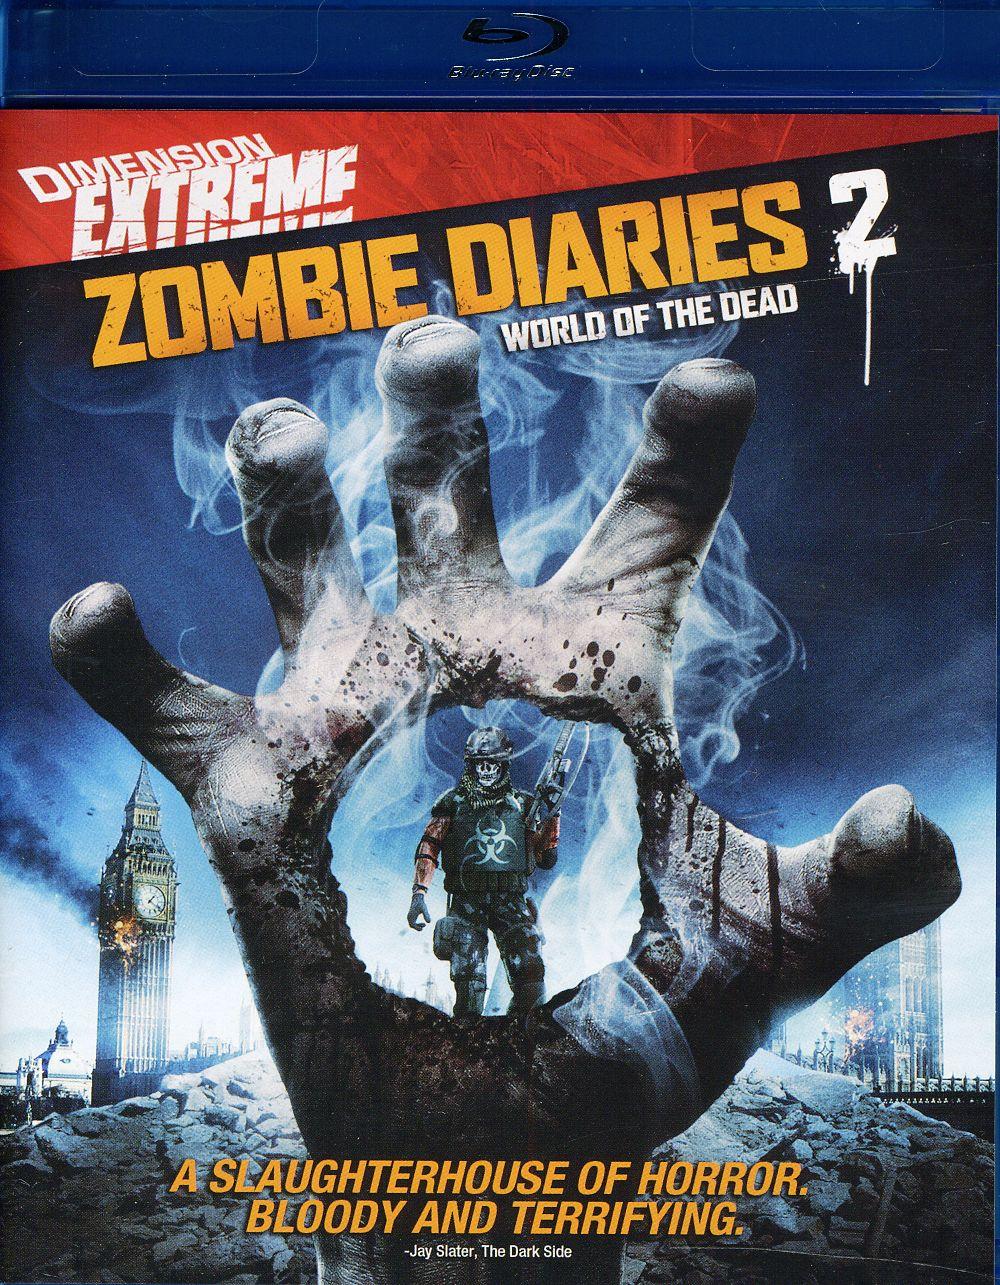 Zombie Diaries 2 (Blu-ray Disc)